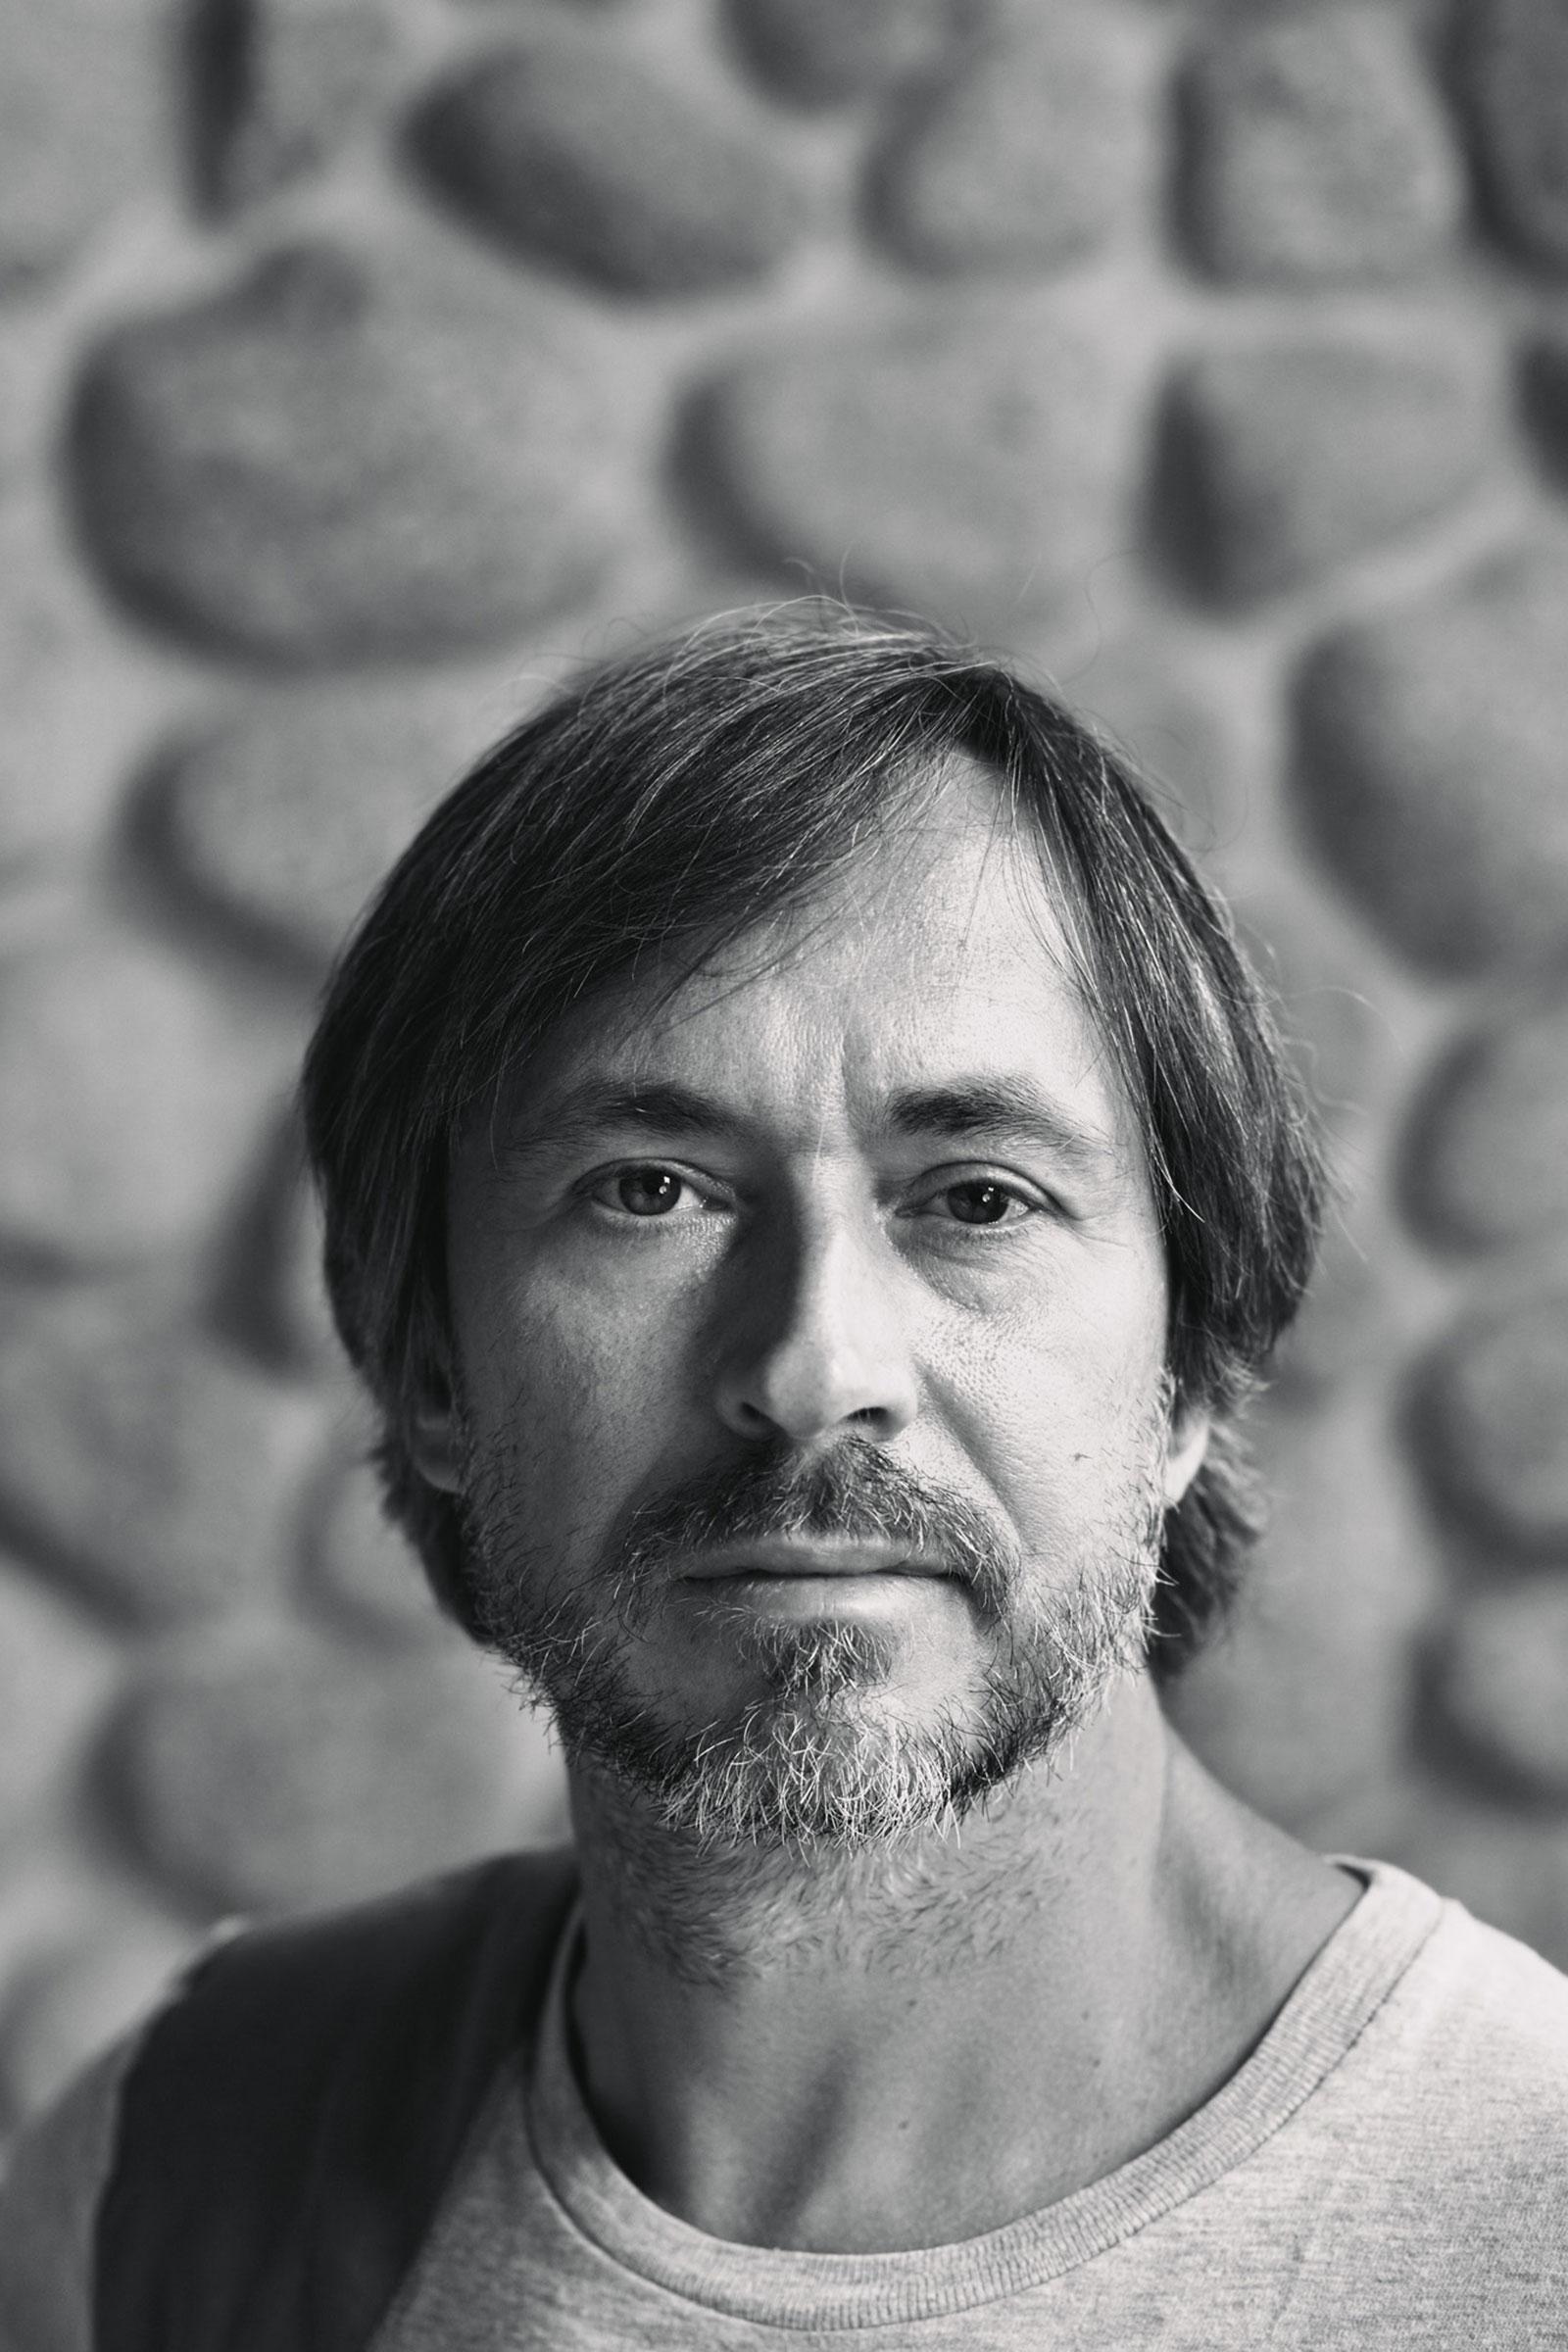 Image by Jørn Tomter. Courtesy Gagosian